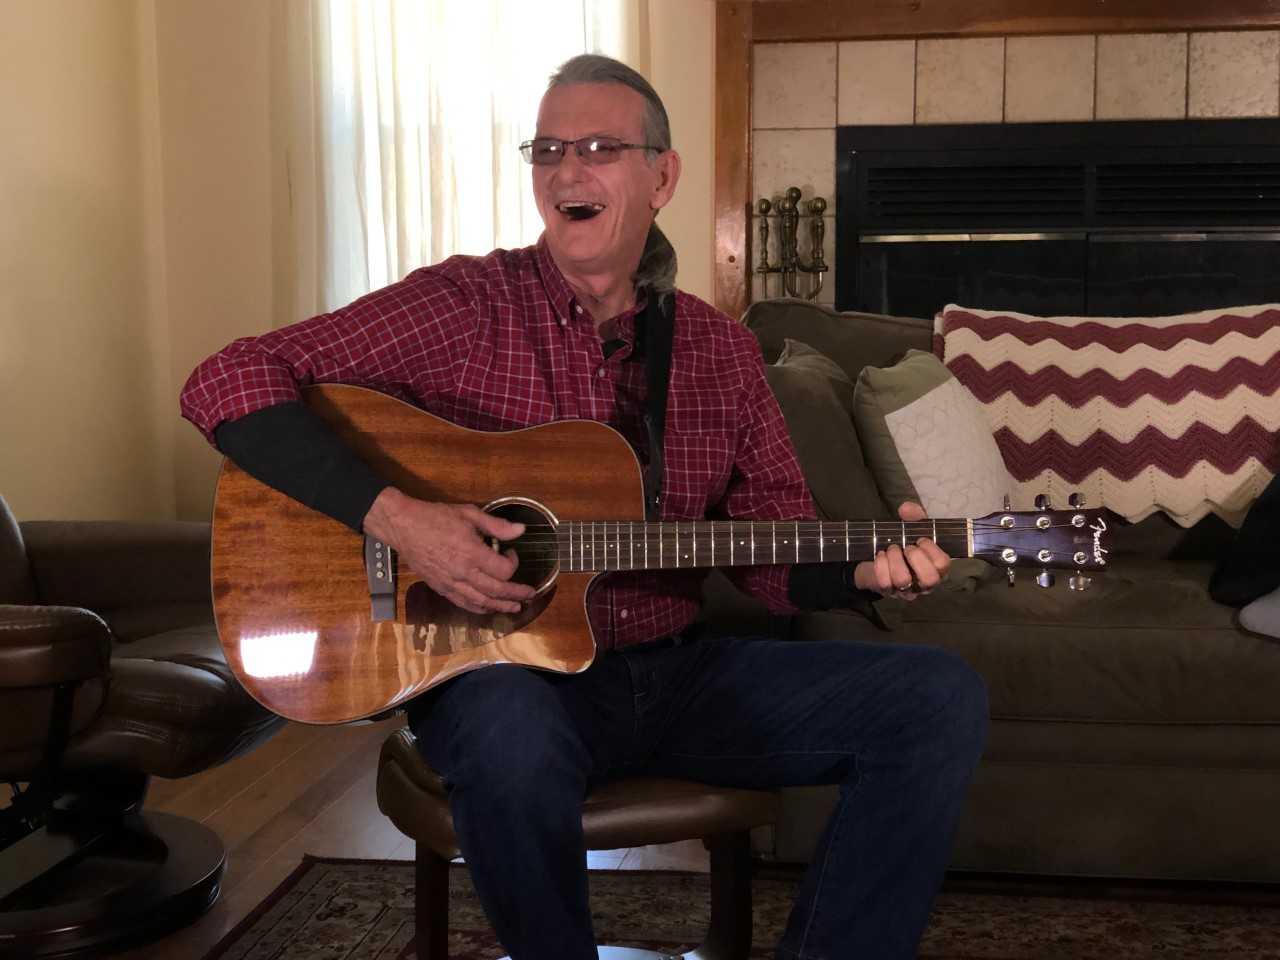 Back to Life: John's Story